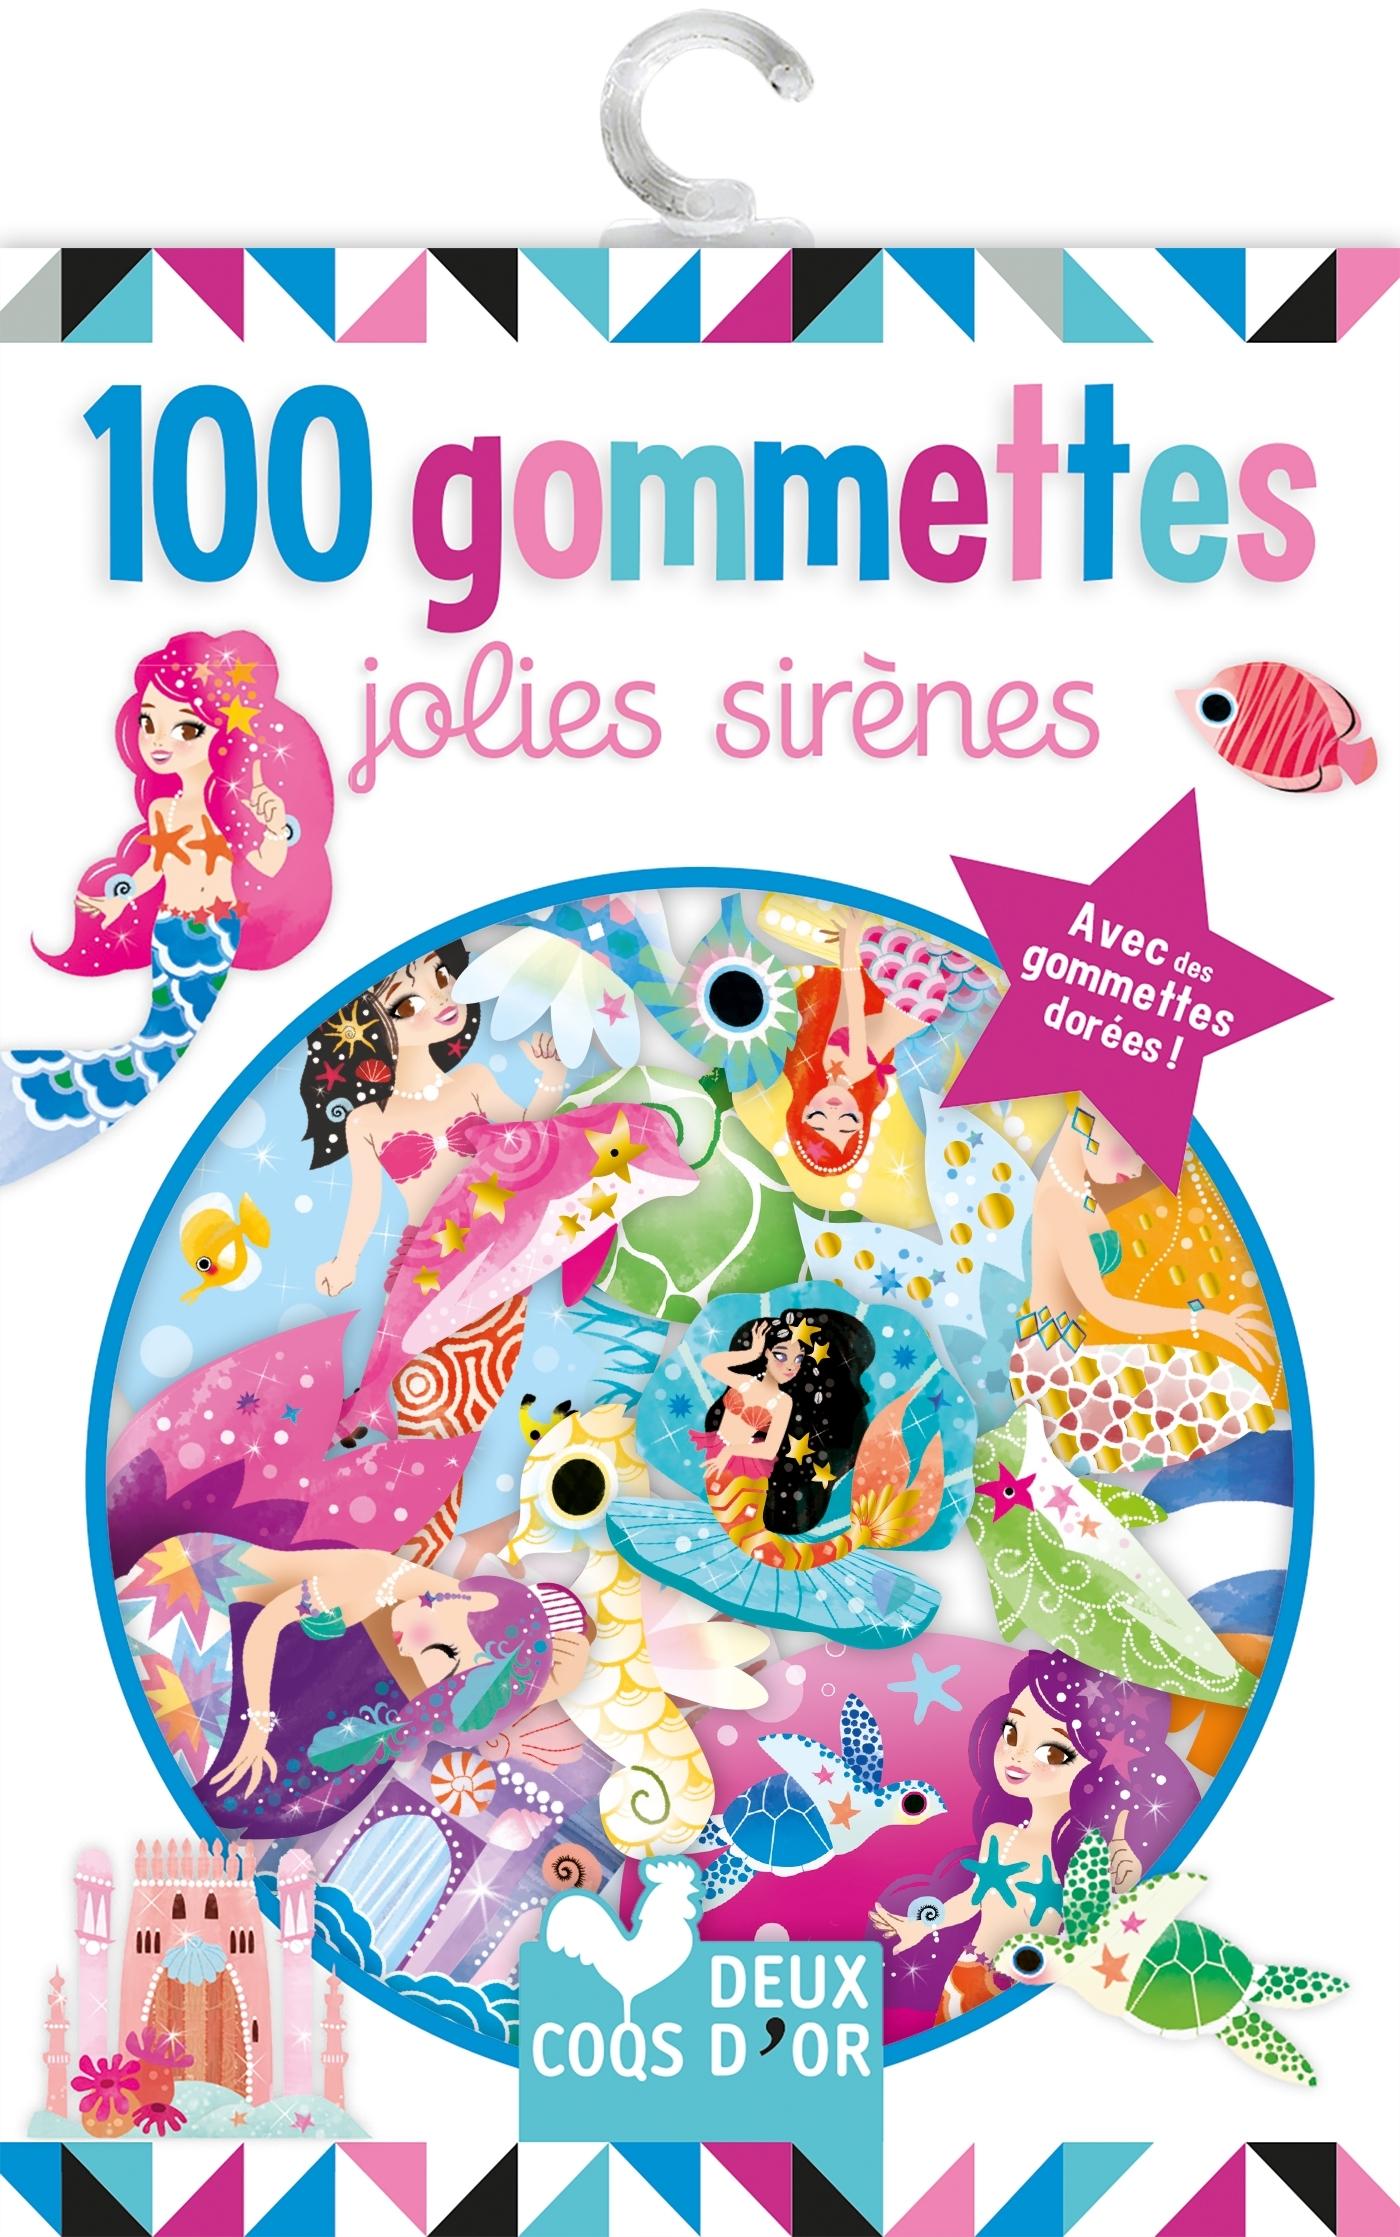 100 GOMMETTES - JOLIES SIRENES